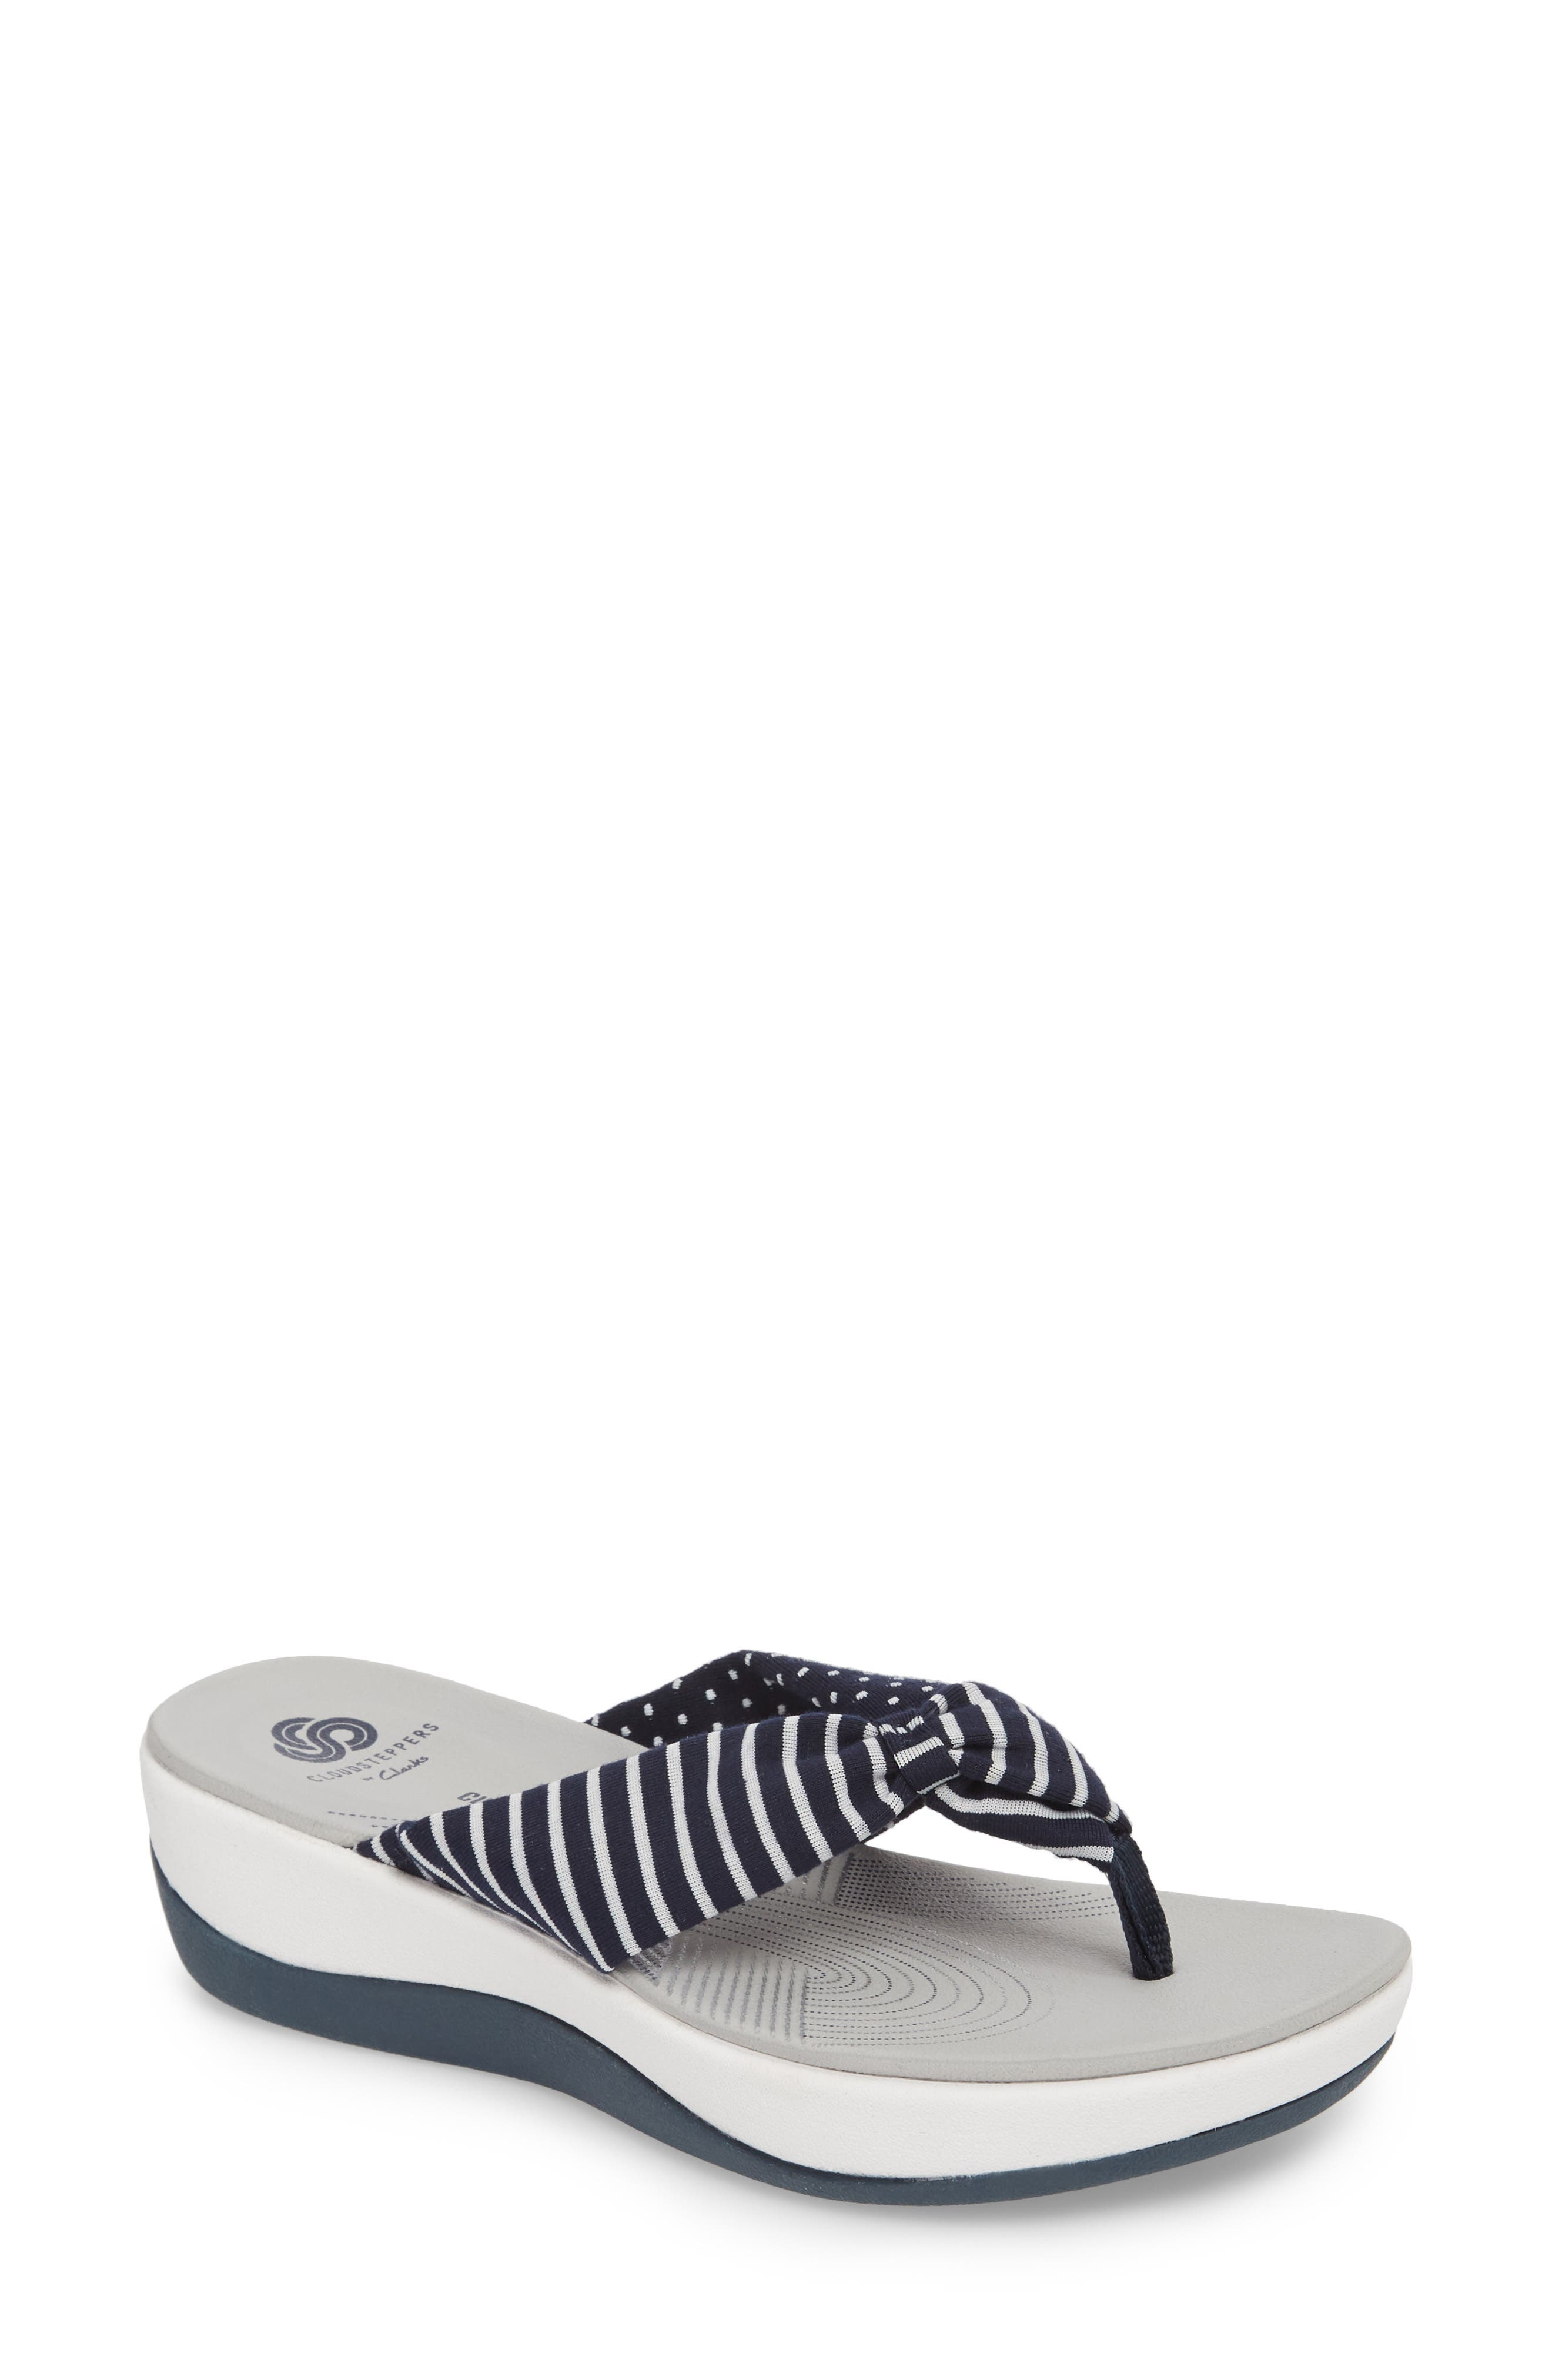 Arla Glison Flip Flop, Main, color, 499